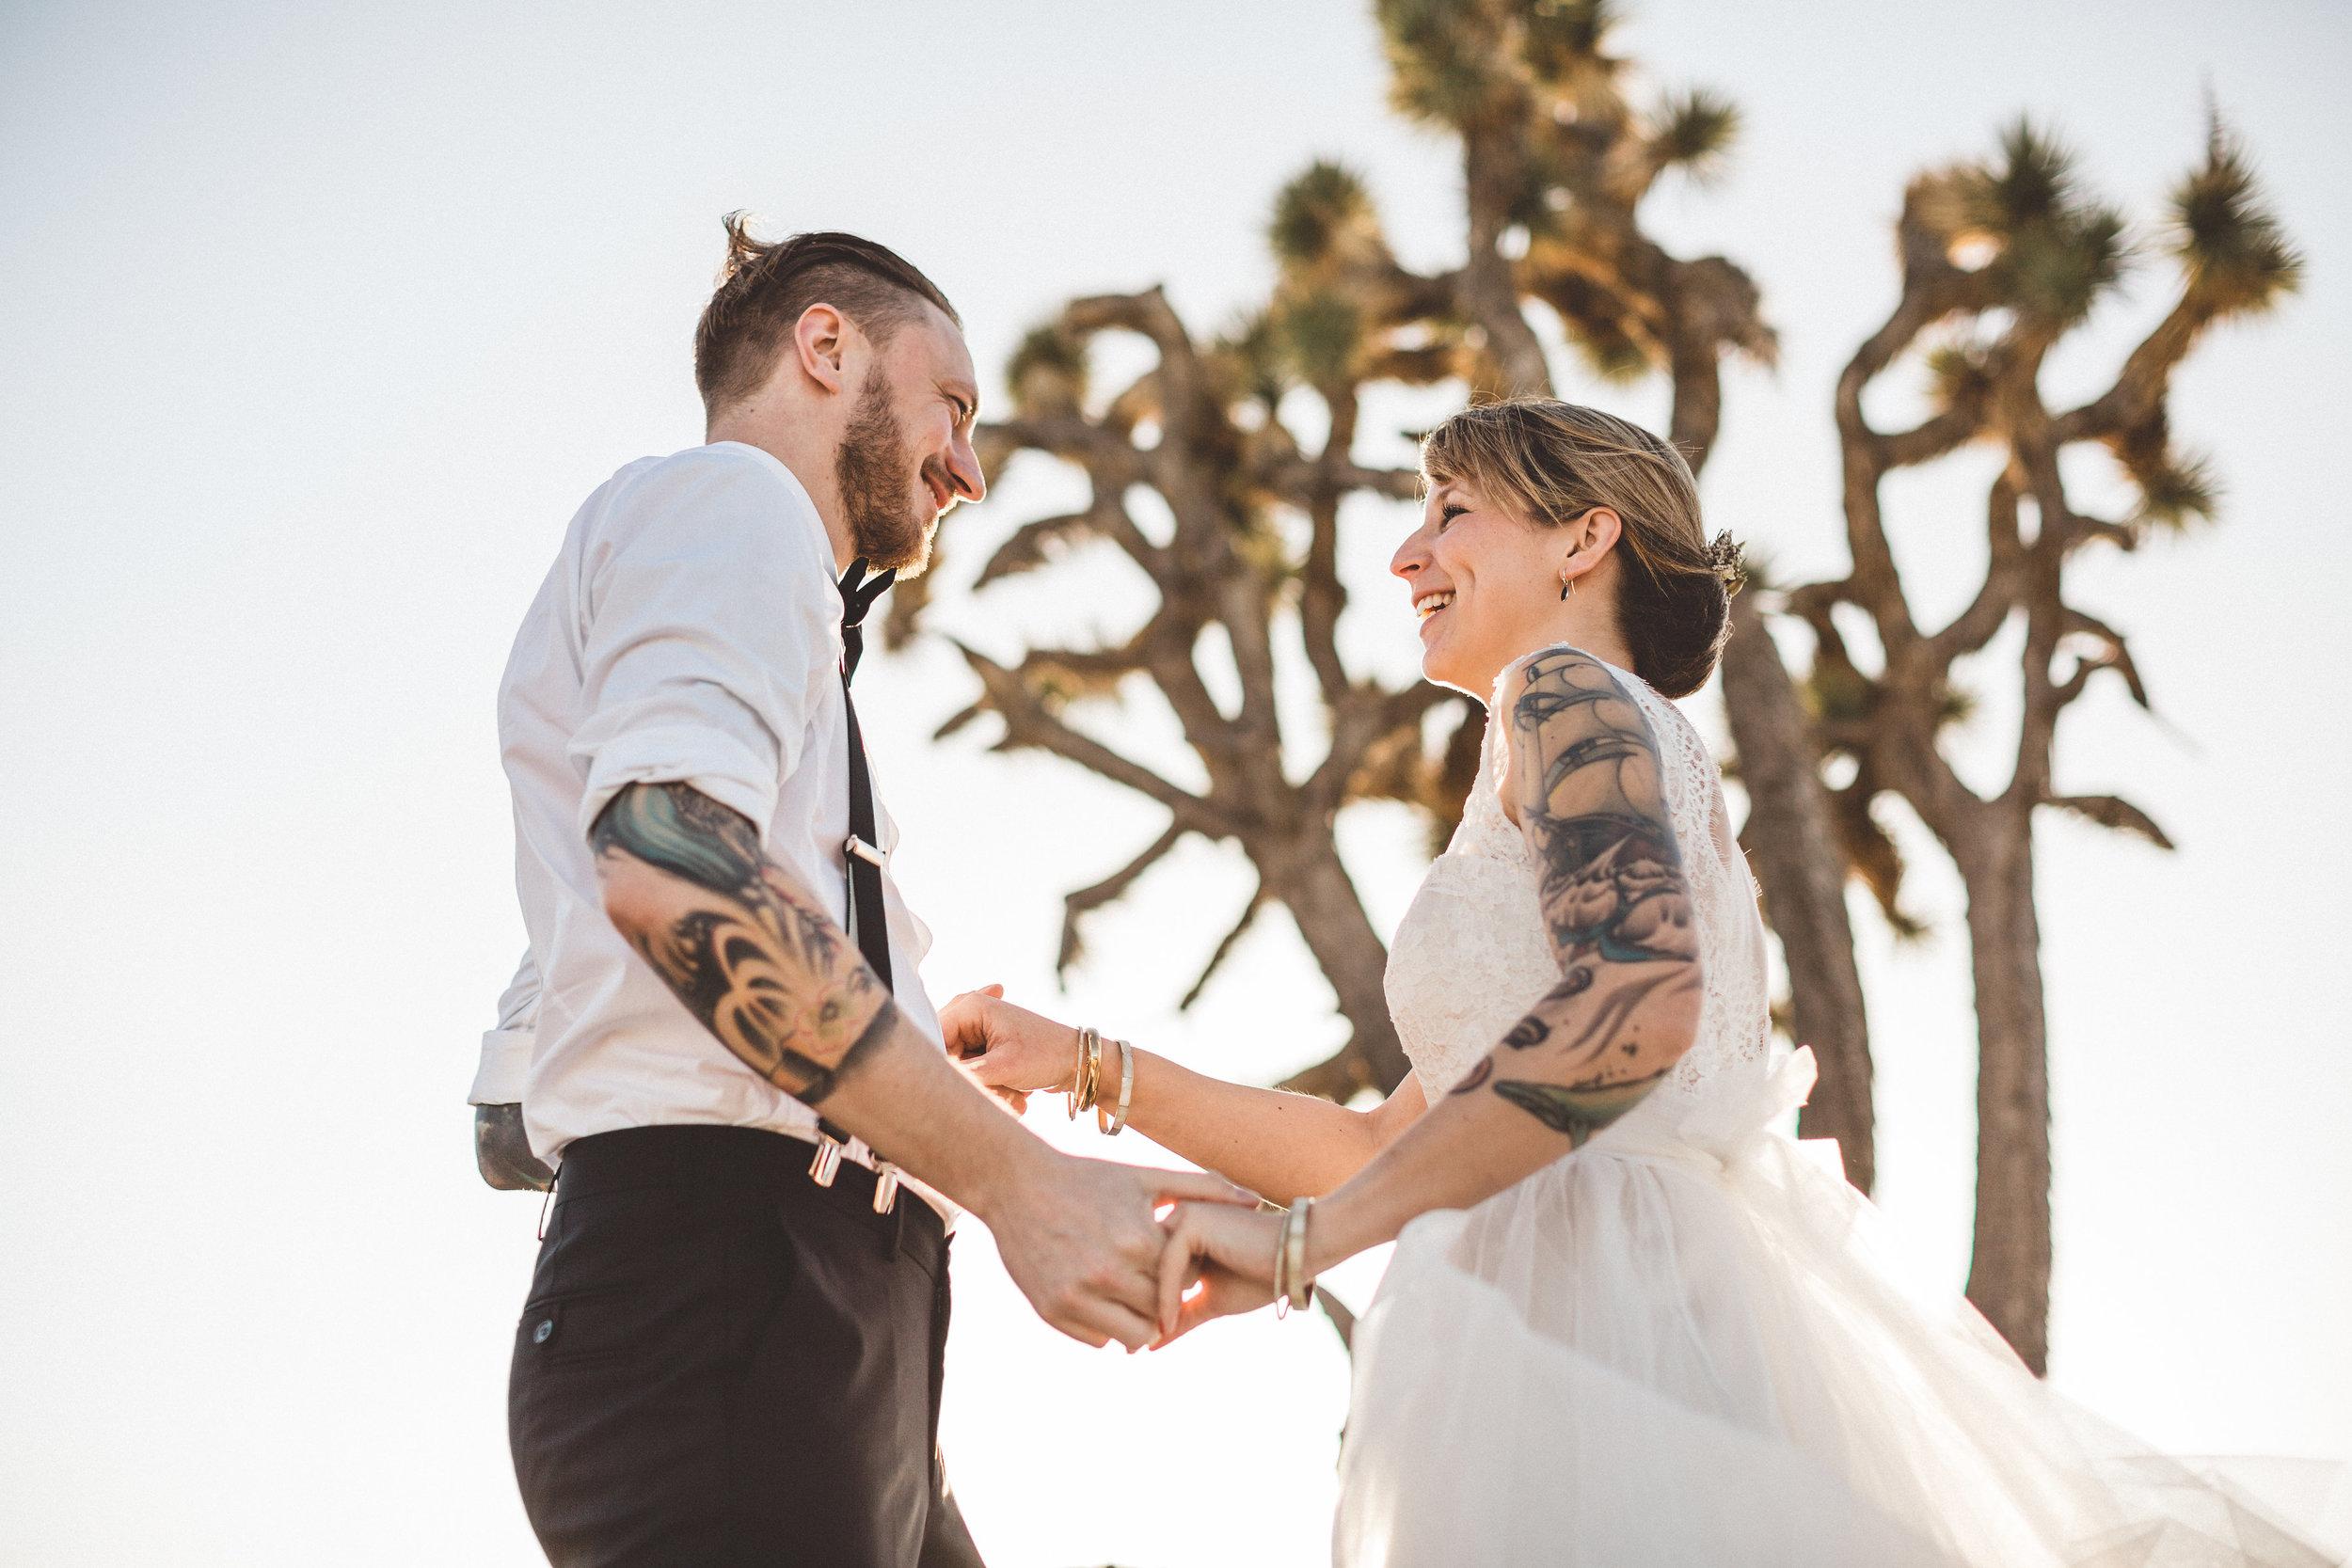 meike-and-rene-las-vegas-desert-elopement28.jpg